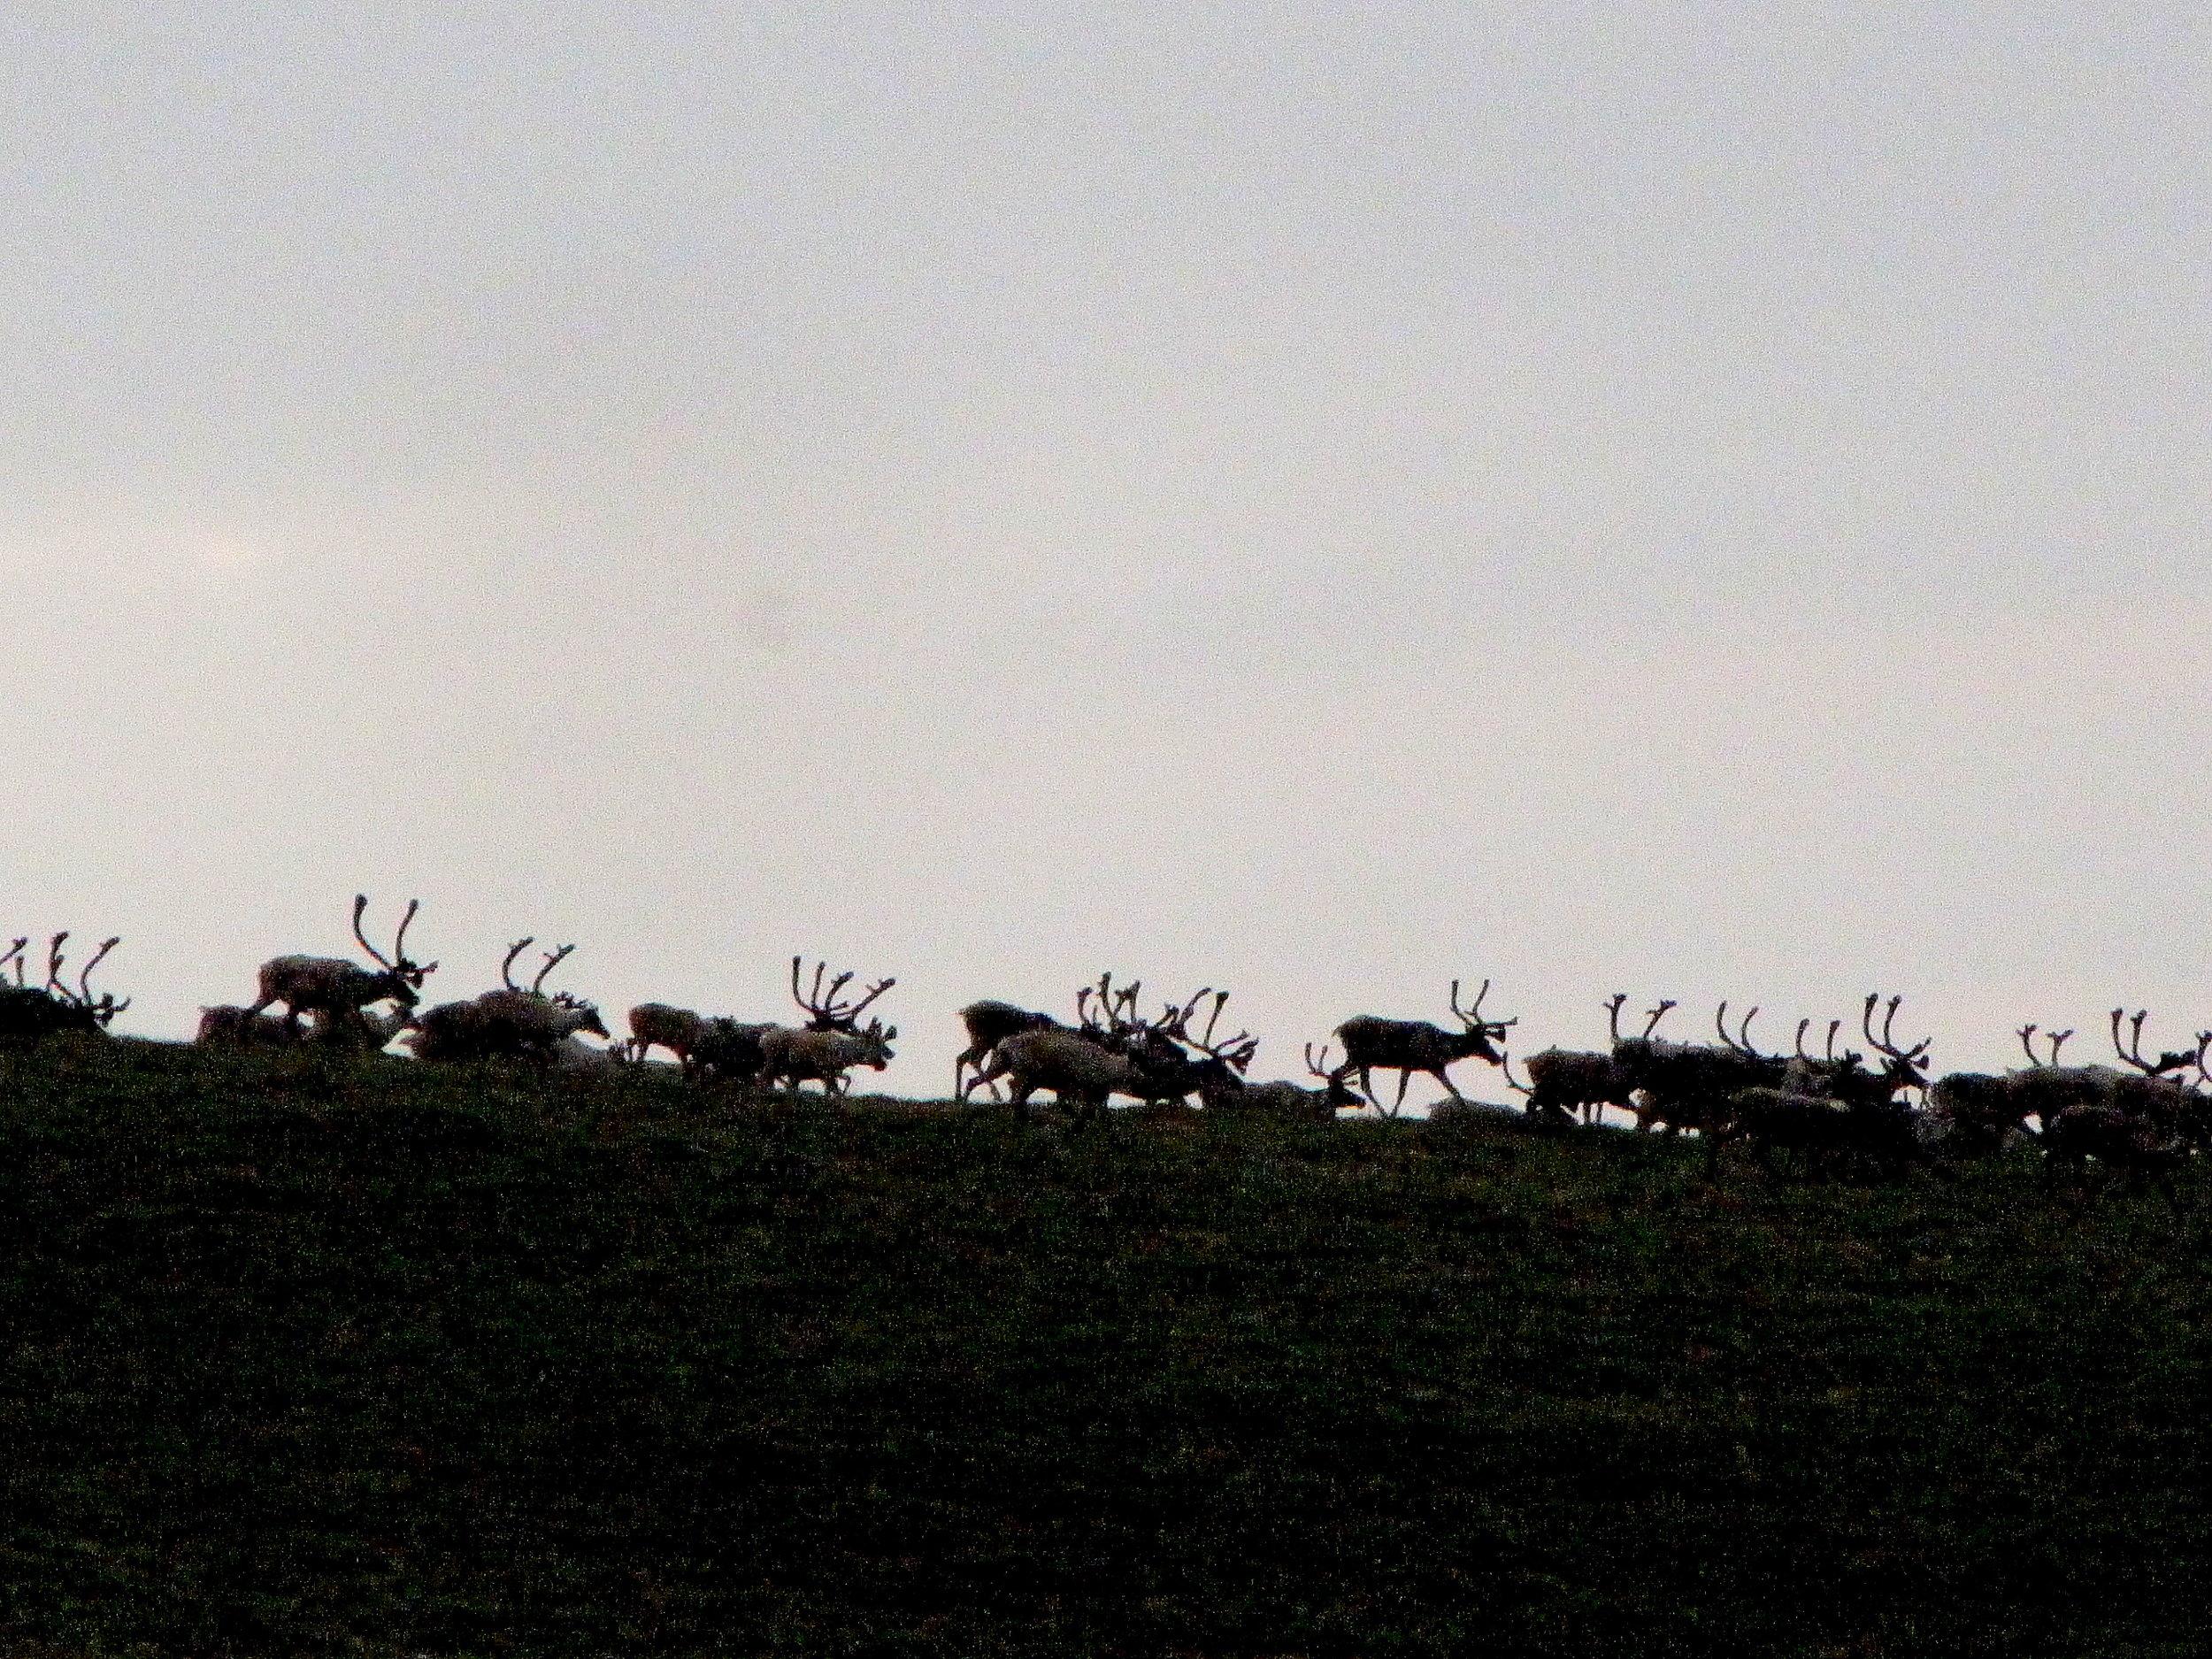 Migrating caribou on a mountain ridge in Alaska's western arctic.